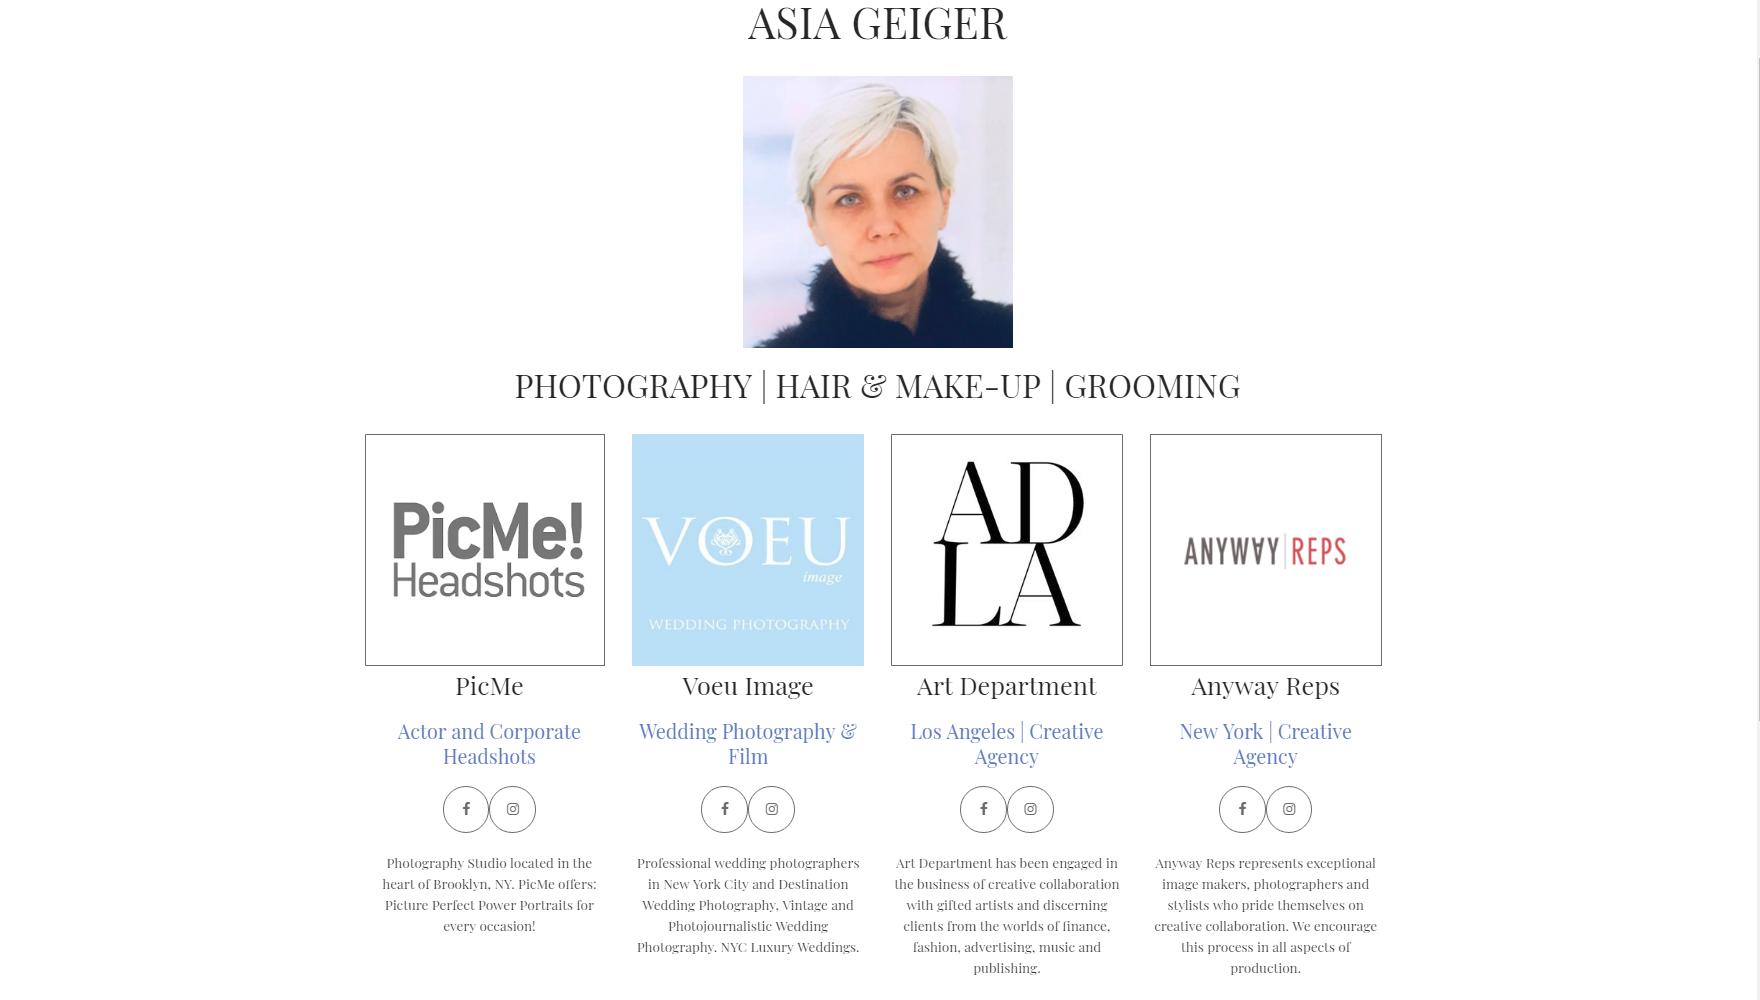 PHOTOGRAPHY | HAIR & MAKE-UP | GROOMING